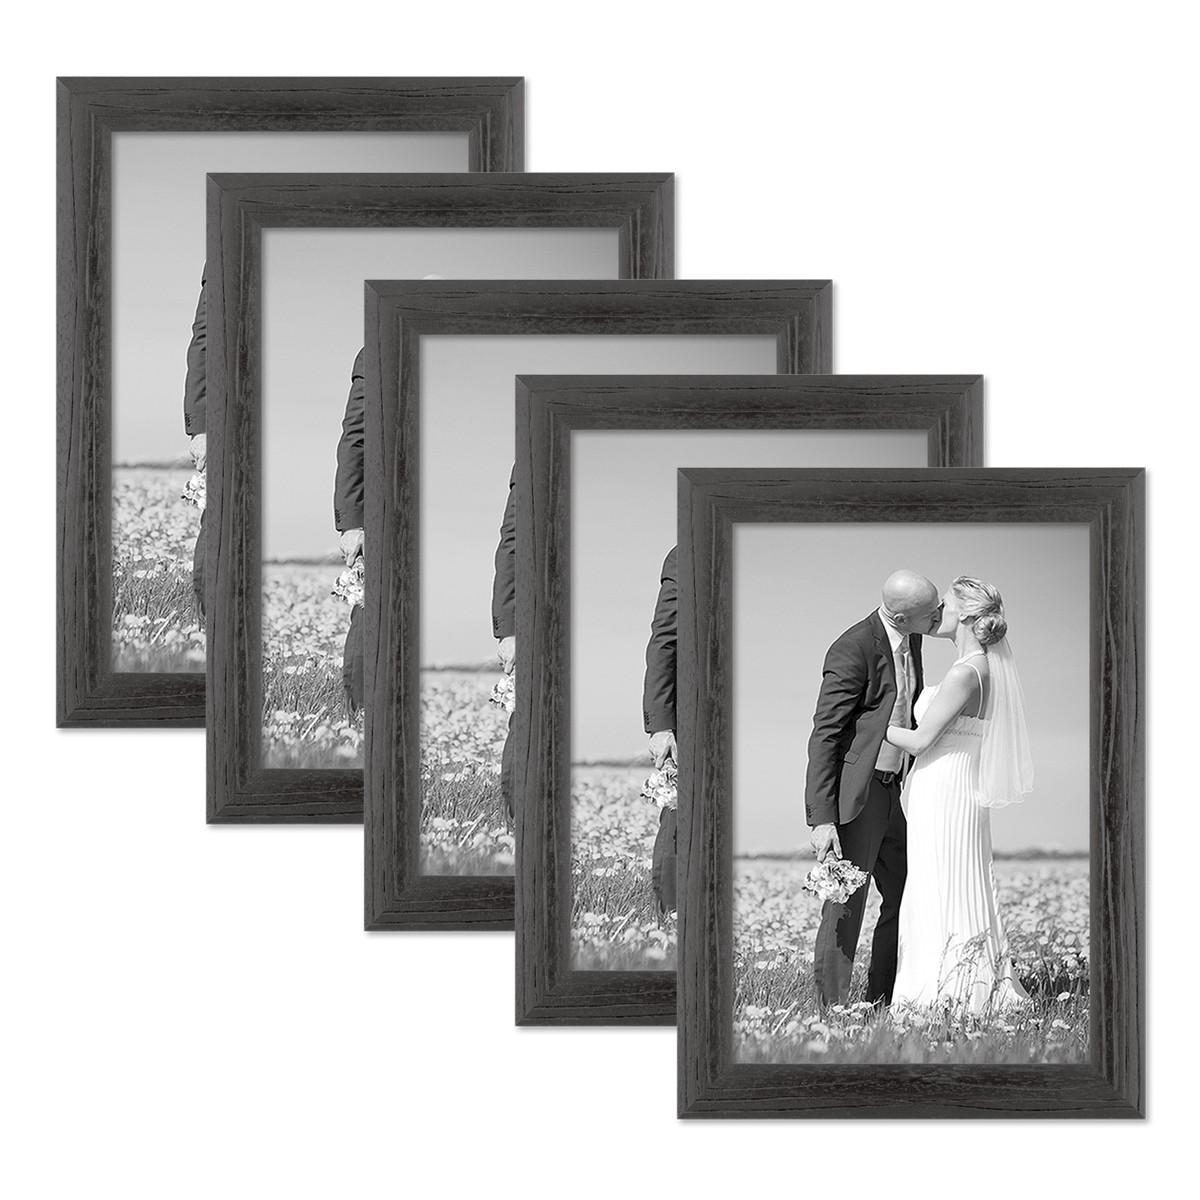 5er set bilderrahmen 21x30 cm din a4 schwarz modern massivholz rahmen mit maserung mit. Black Bedroom Furniture Sets. Home Design Ideas